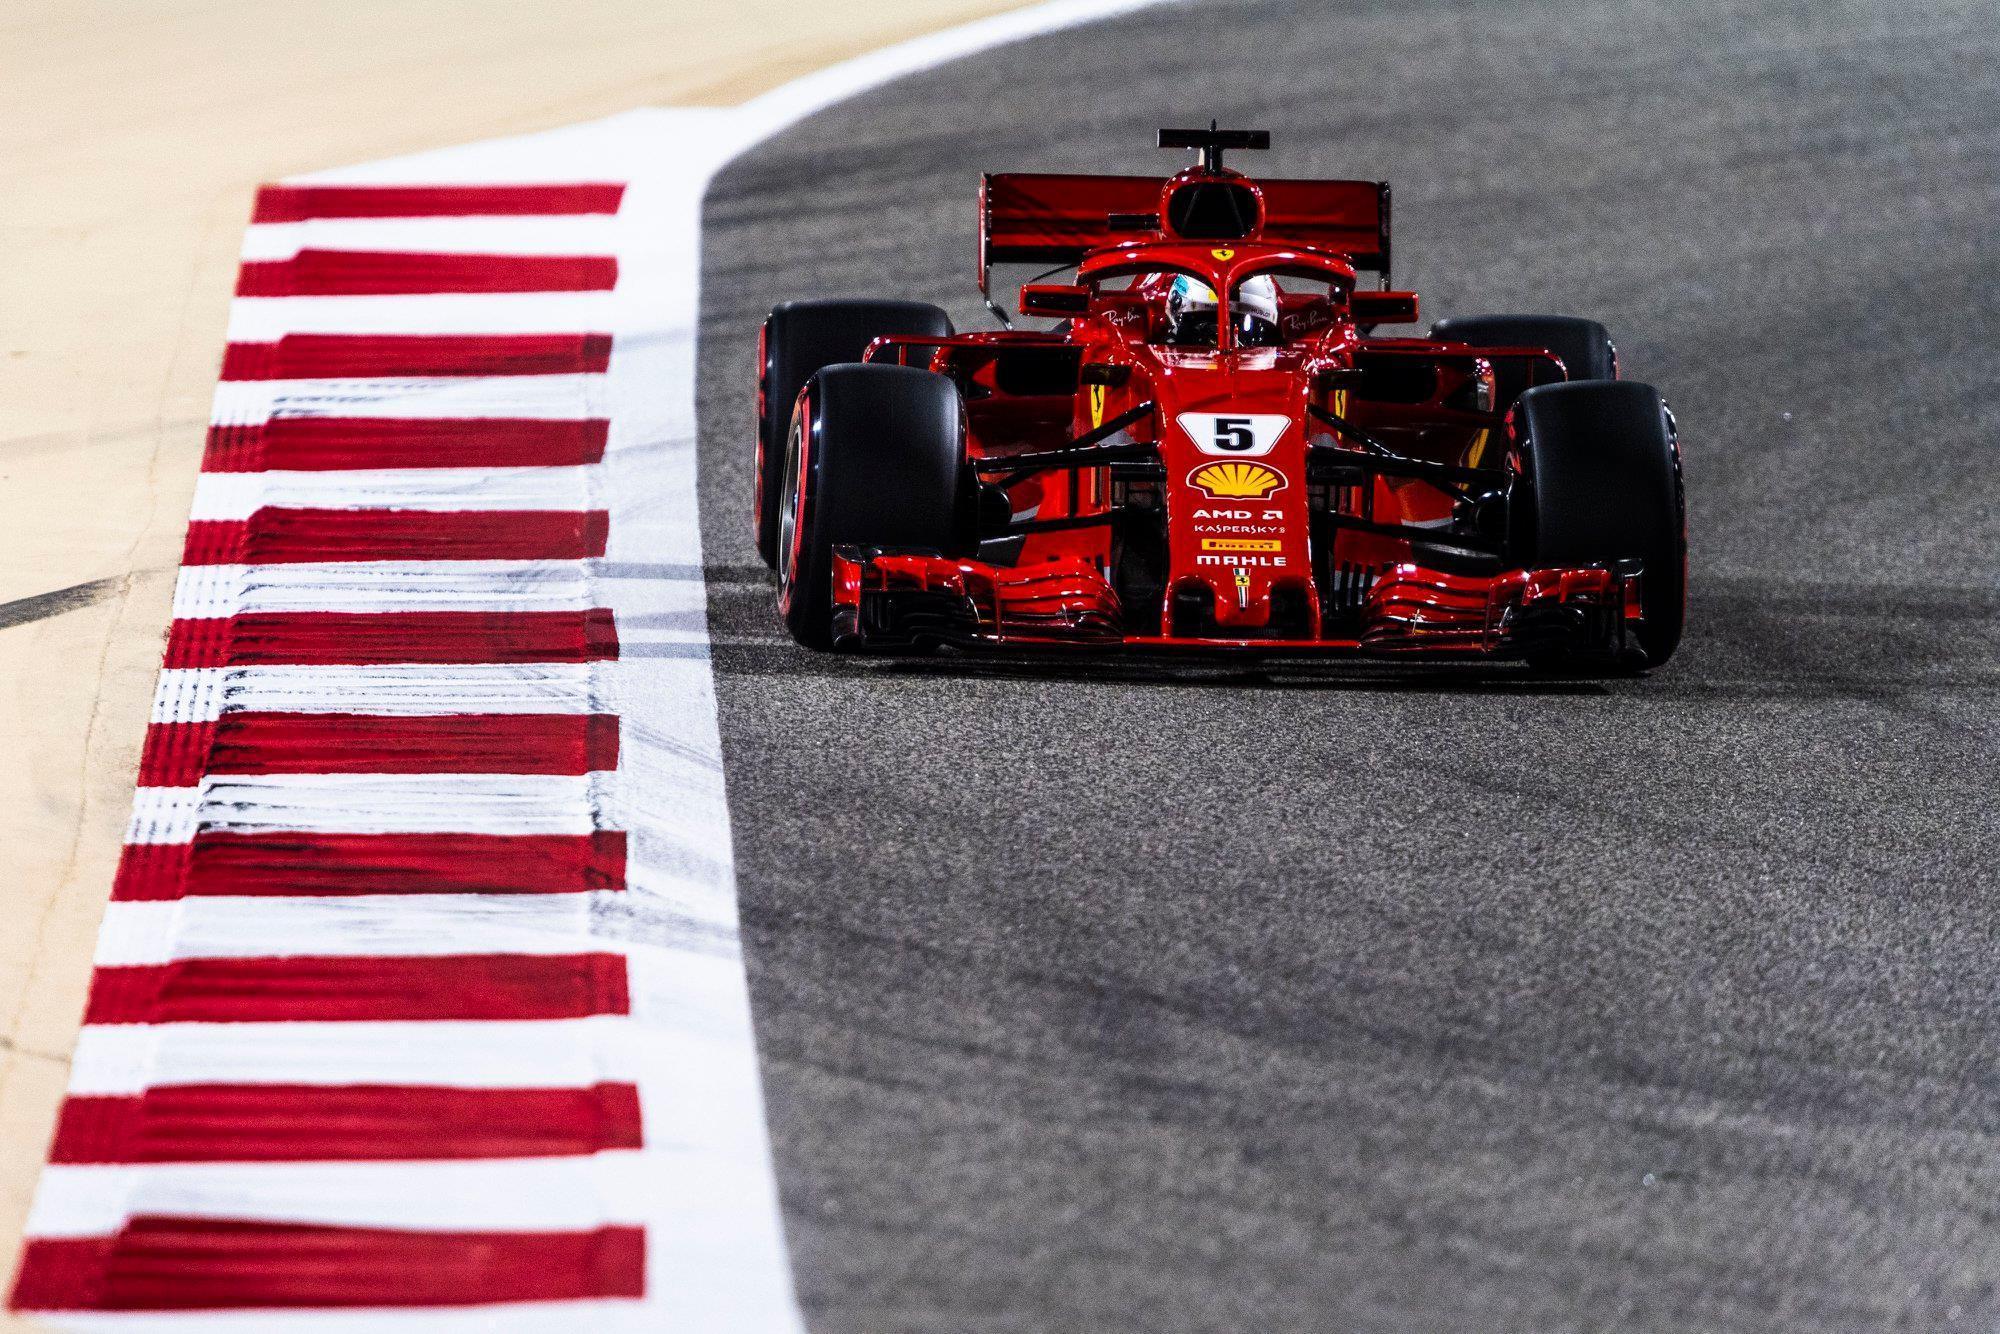 F1 - GP de Bahreïn (Essais libres 2) : Ferrari a frappé très fort